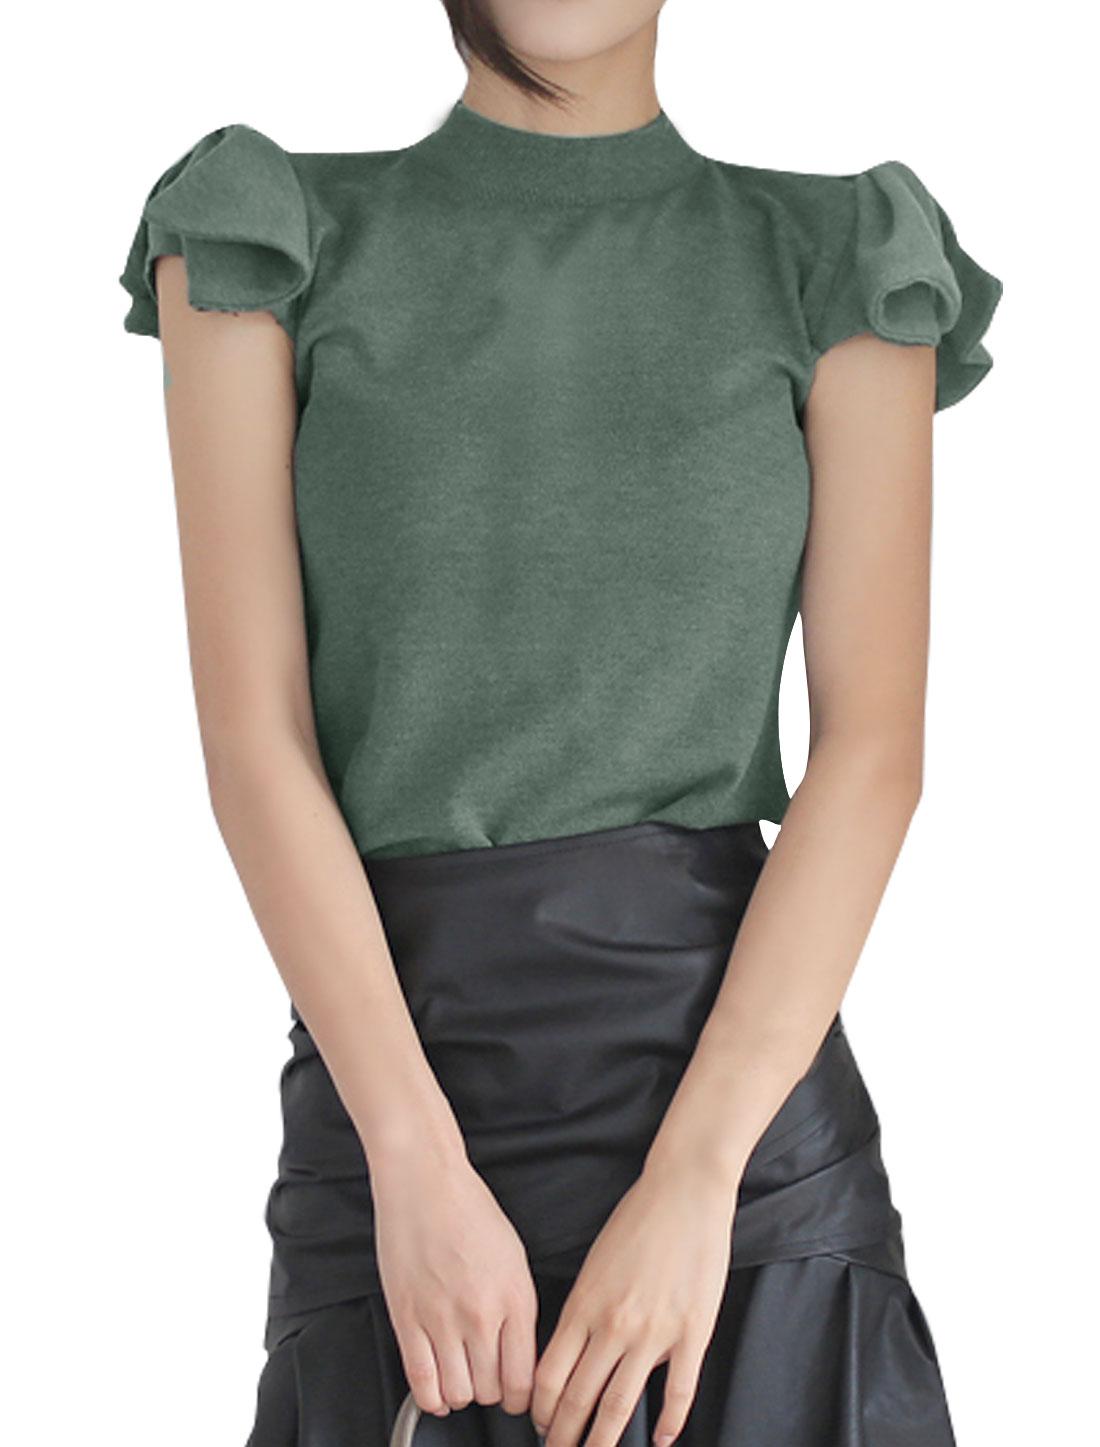 Women Cap Sleeves Mock Neck Bowknot Decor Slim Fit Top Gray S